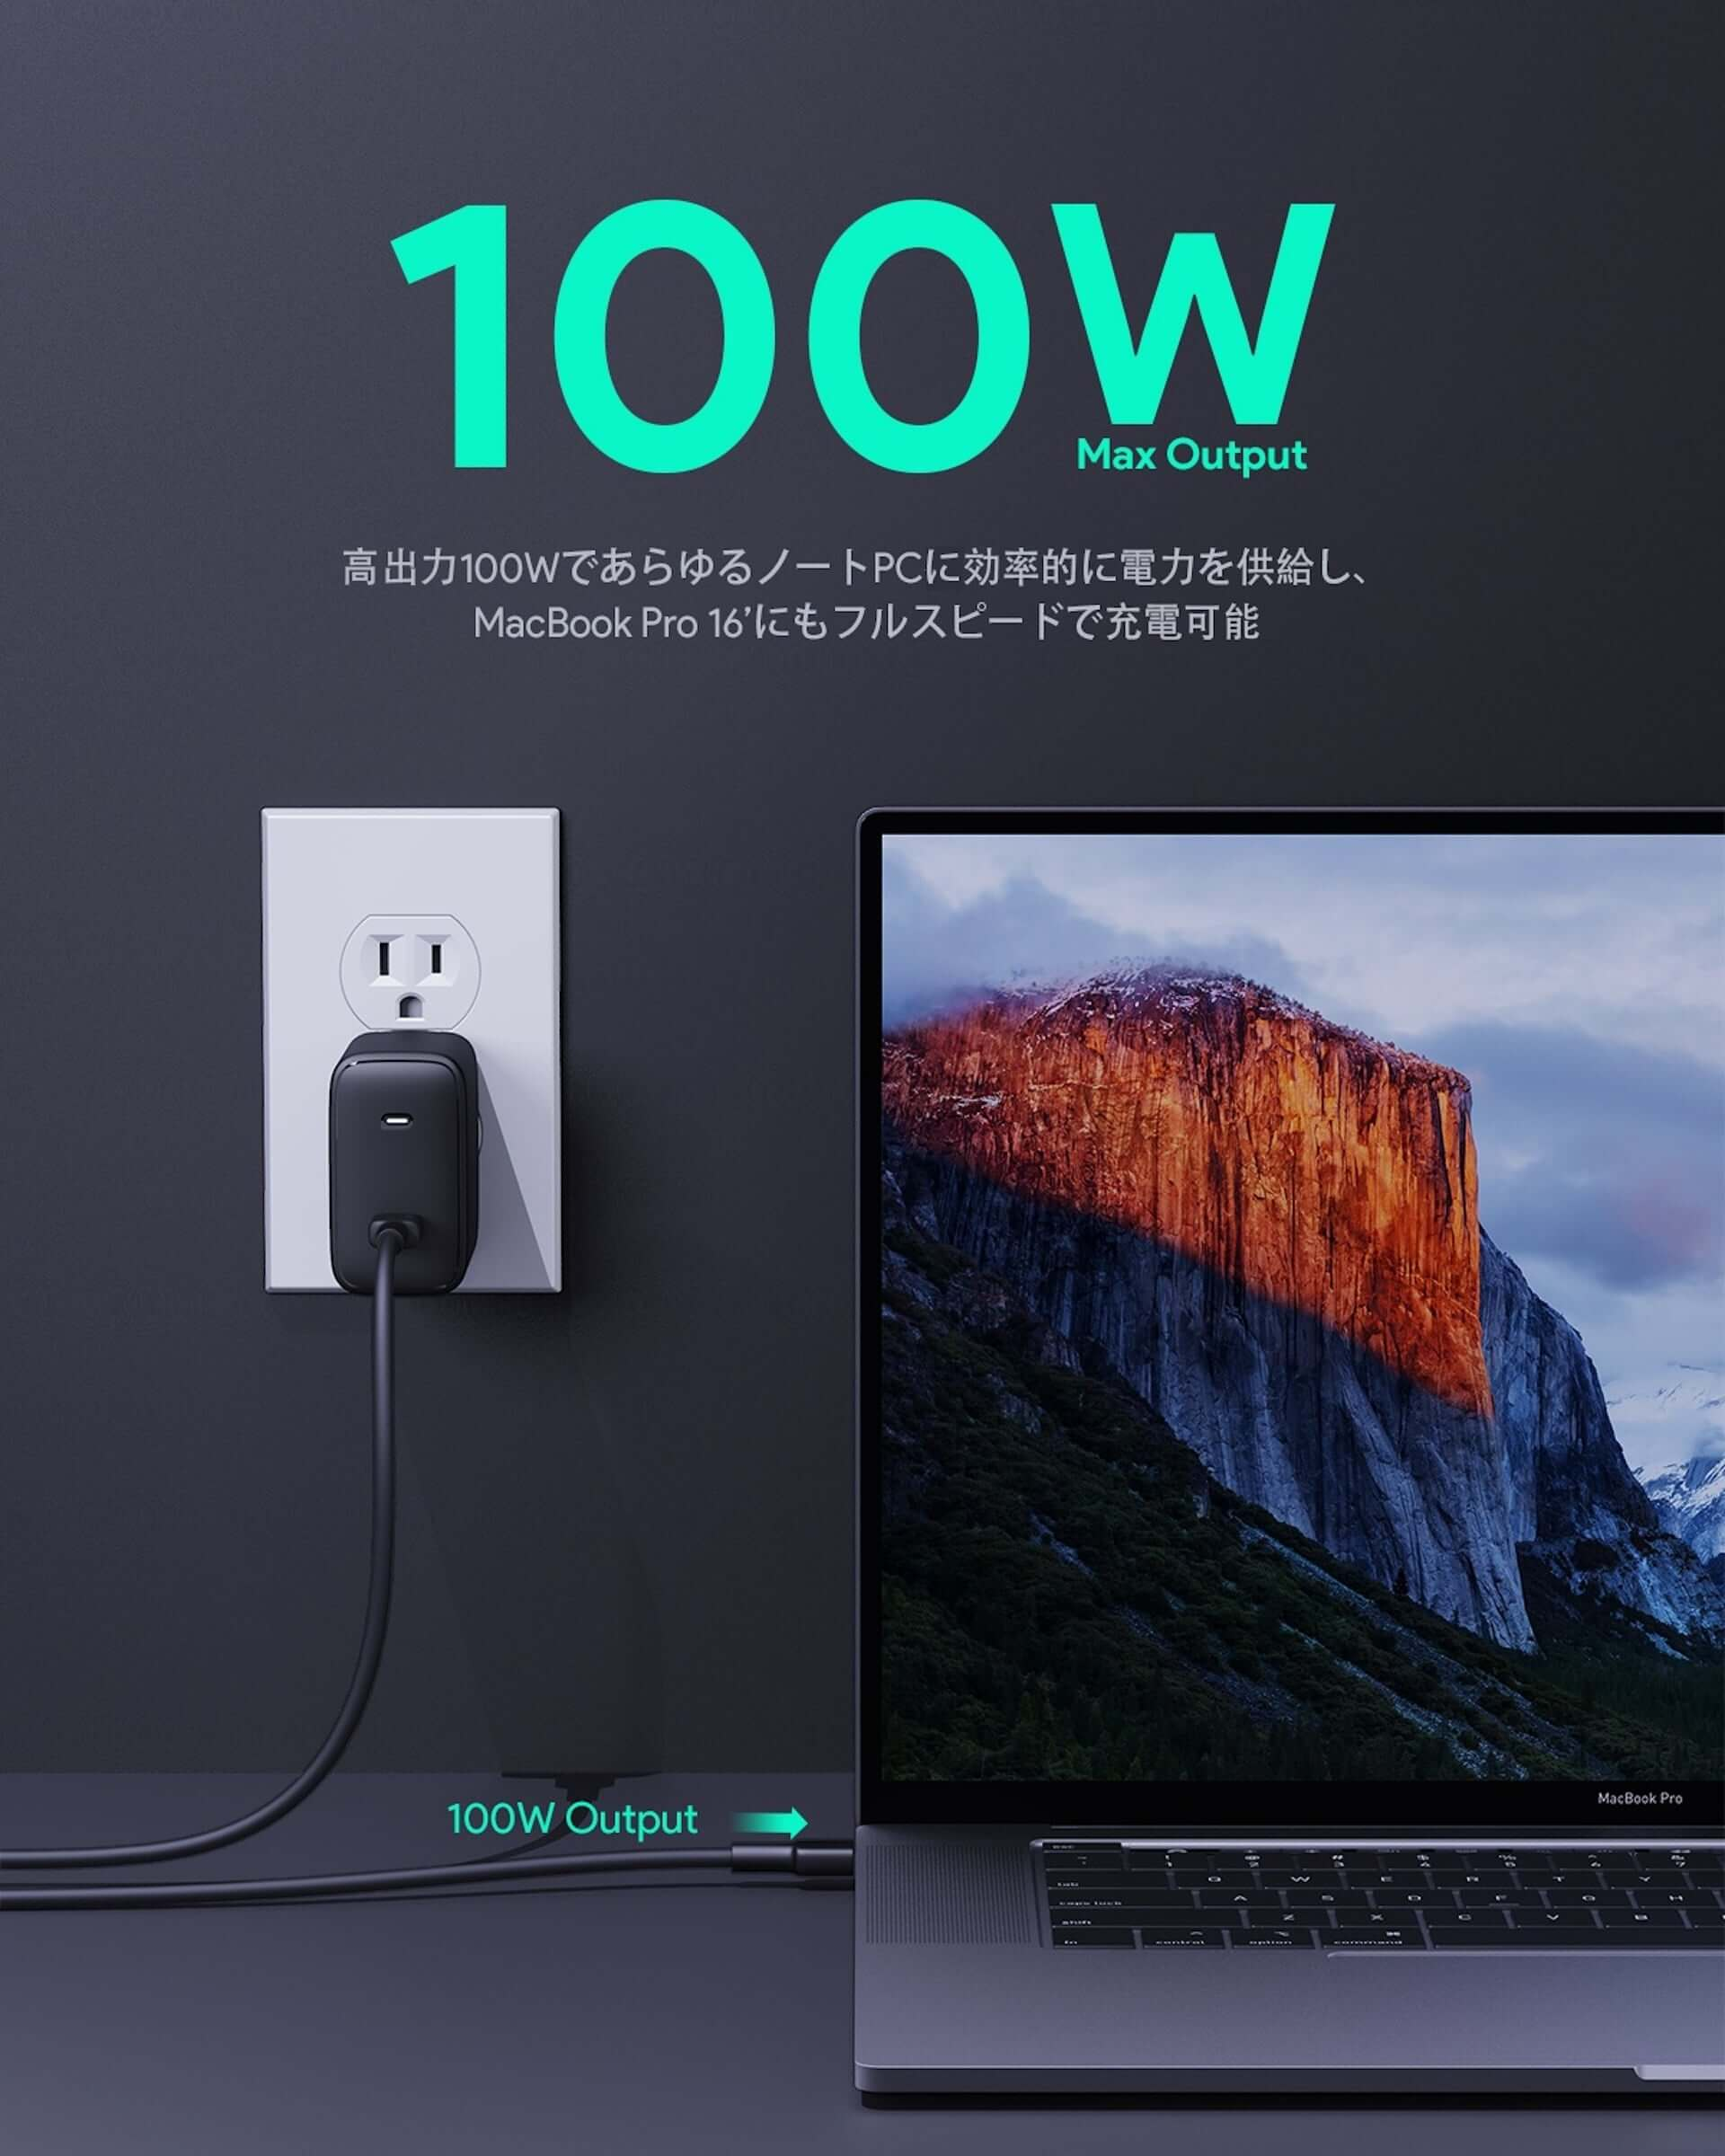 AUKEYの最小&最軽量クラスの100W急速充電器『PA-B5』がAmazonで20%OFFに!期間限定クーポンコードが登場 tech200714_aukey_3-1920x2400